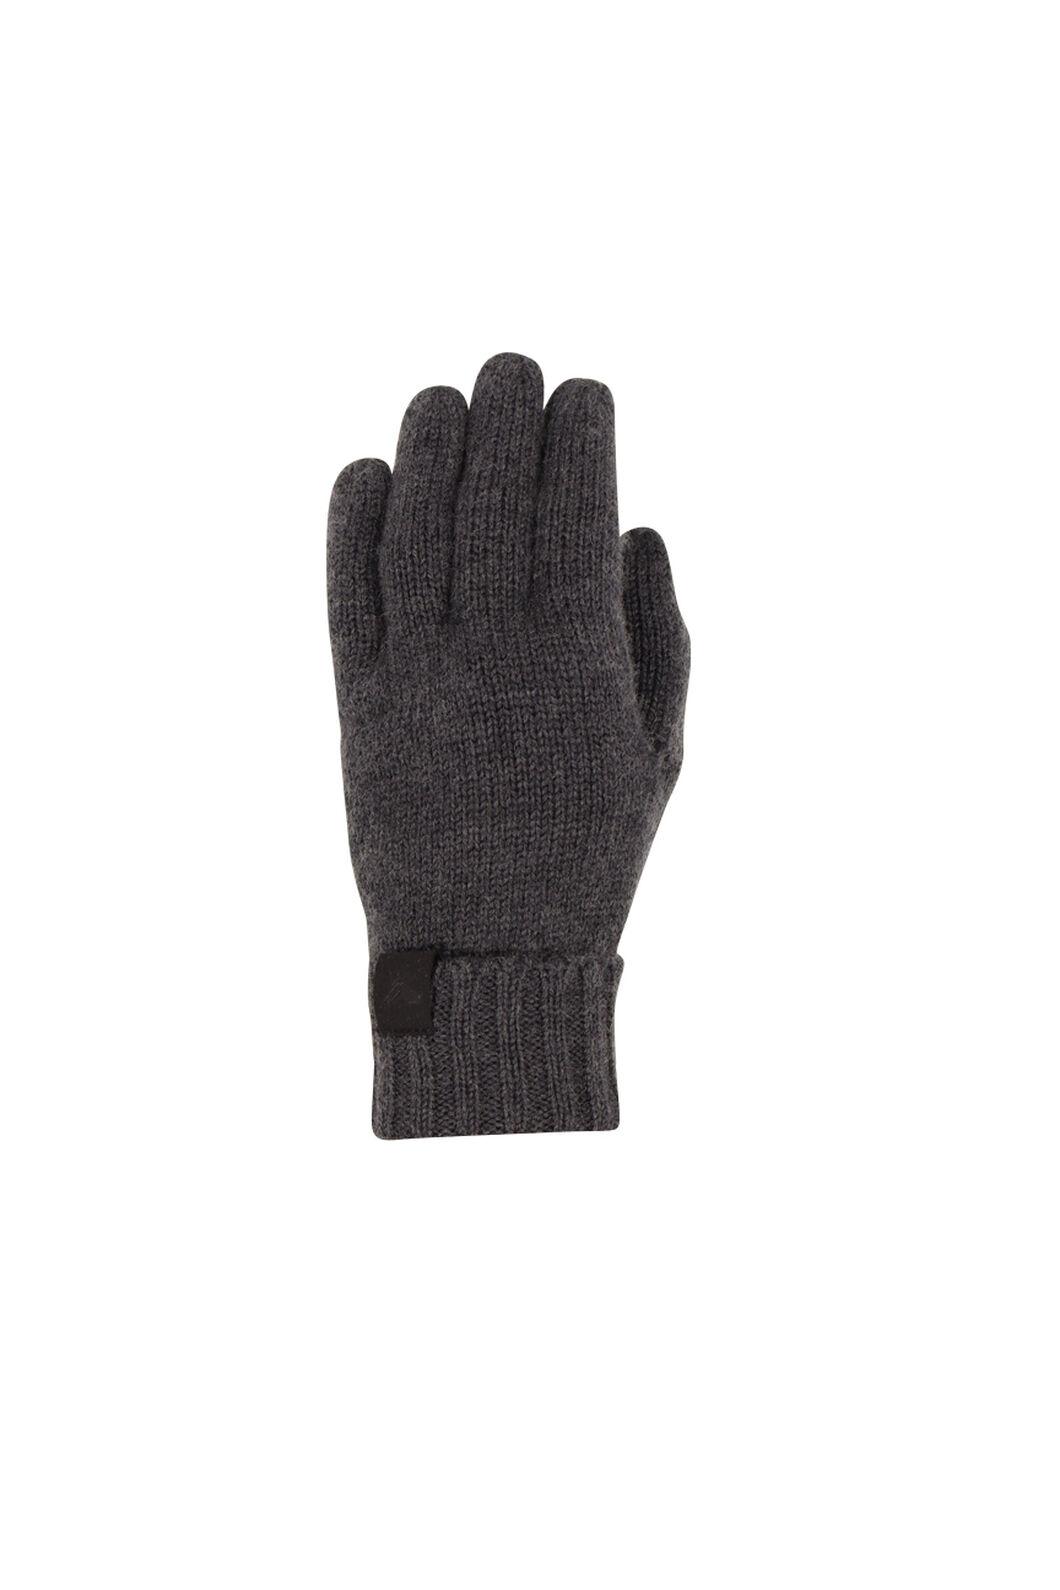 Macpac Merino Gloves, Charcoal Melange, hi-res